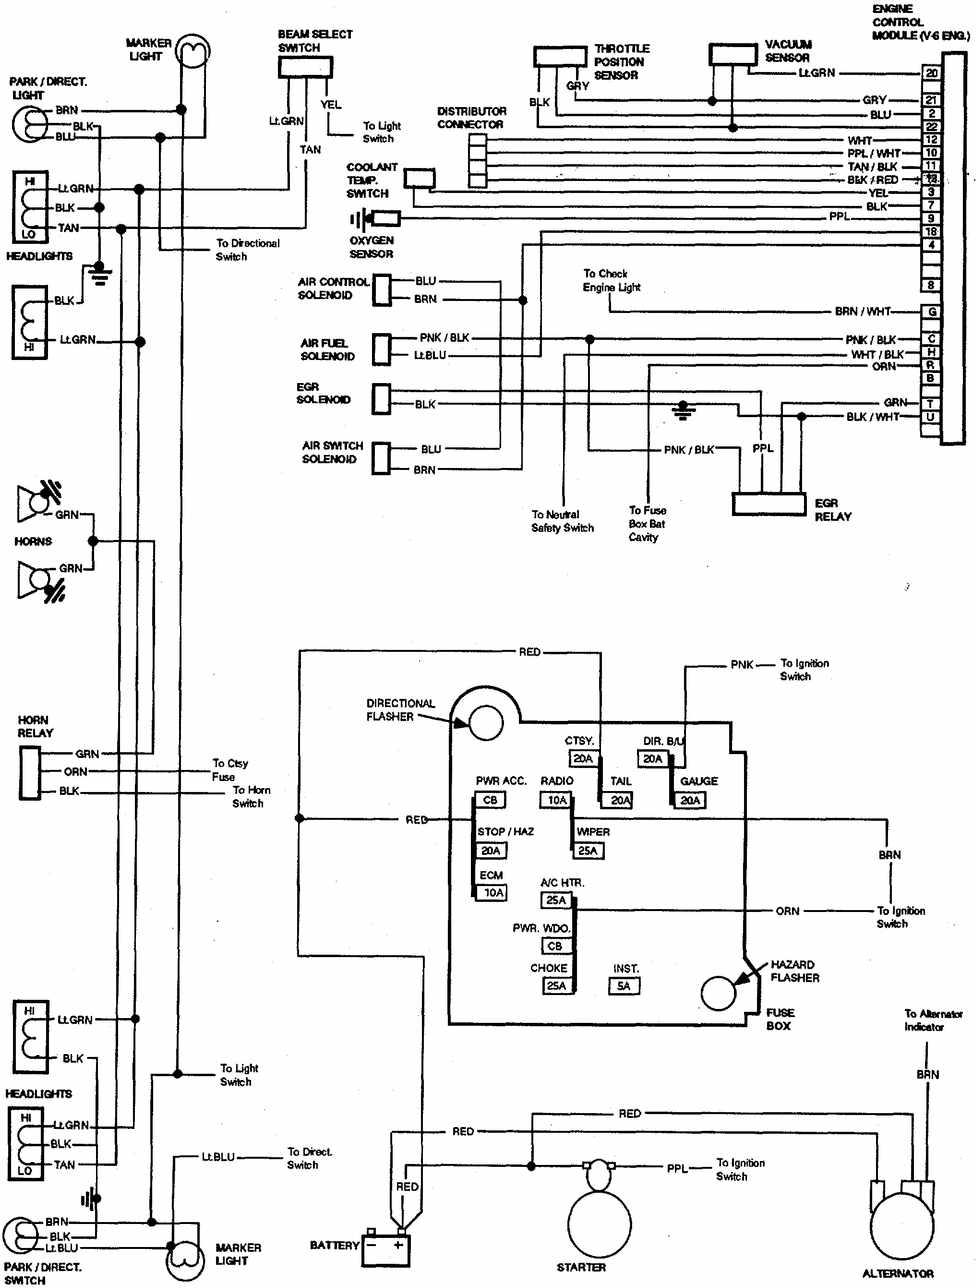 96 s10 headlight wiring diagram